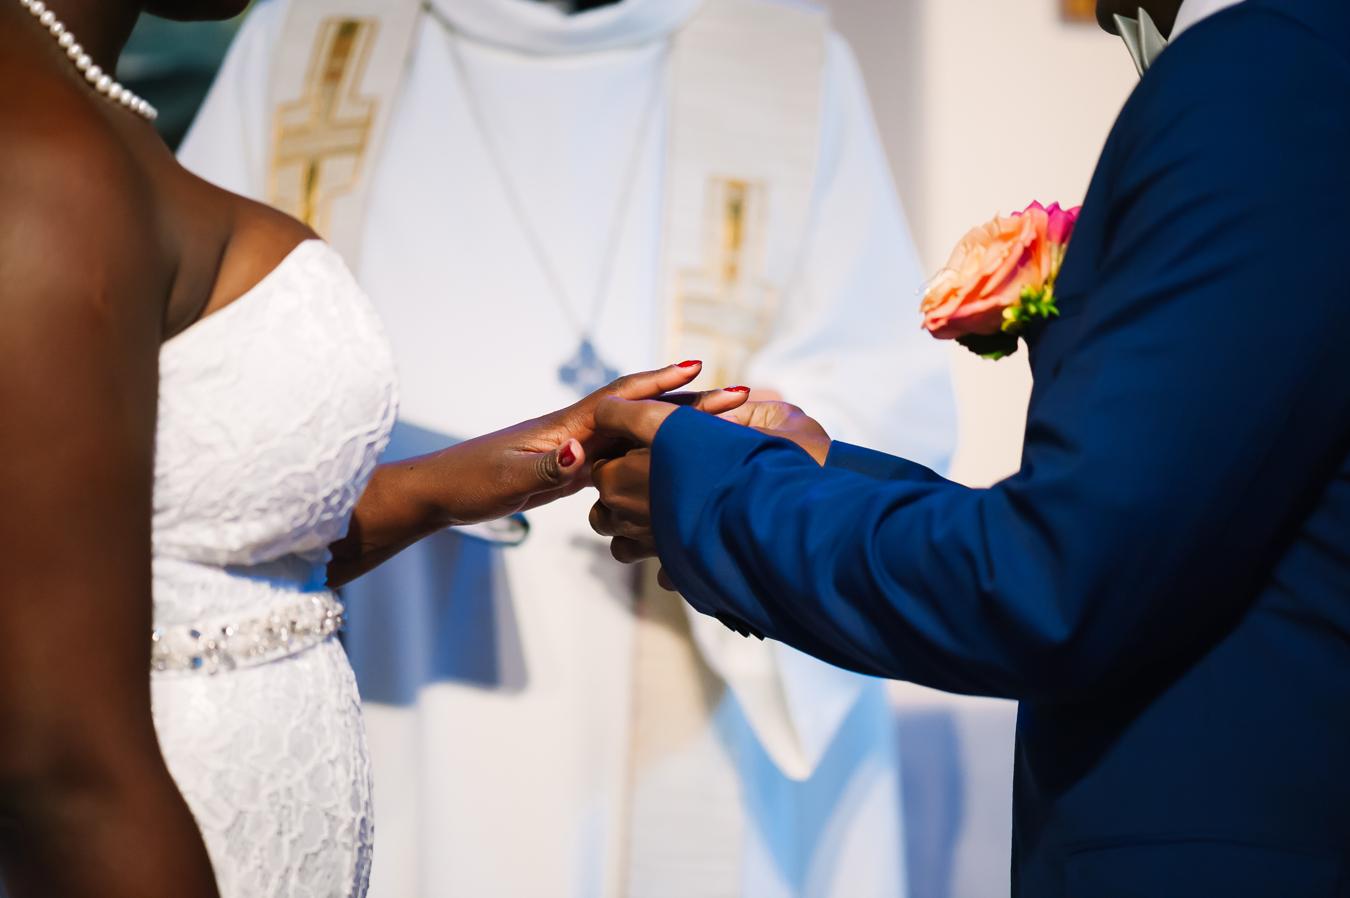 027-bröllop-gotland-fridhem-neas-fotografi.jpg